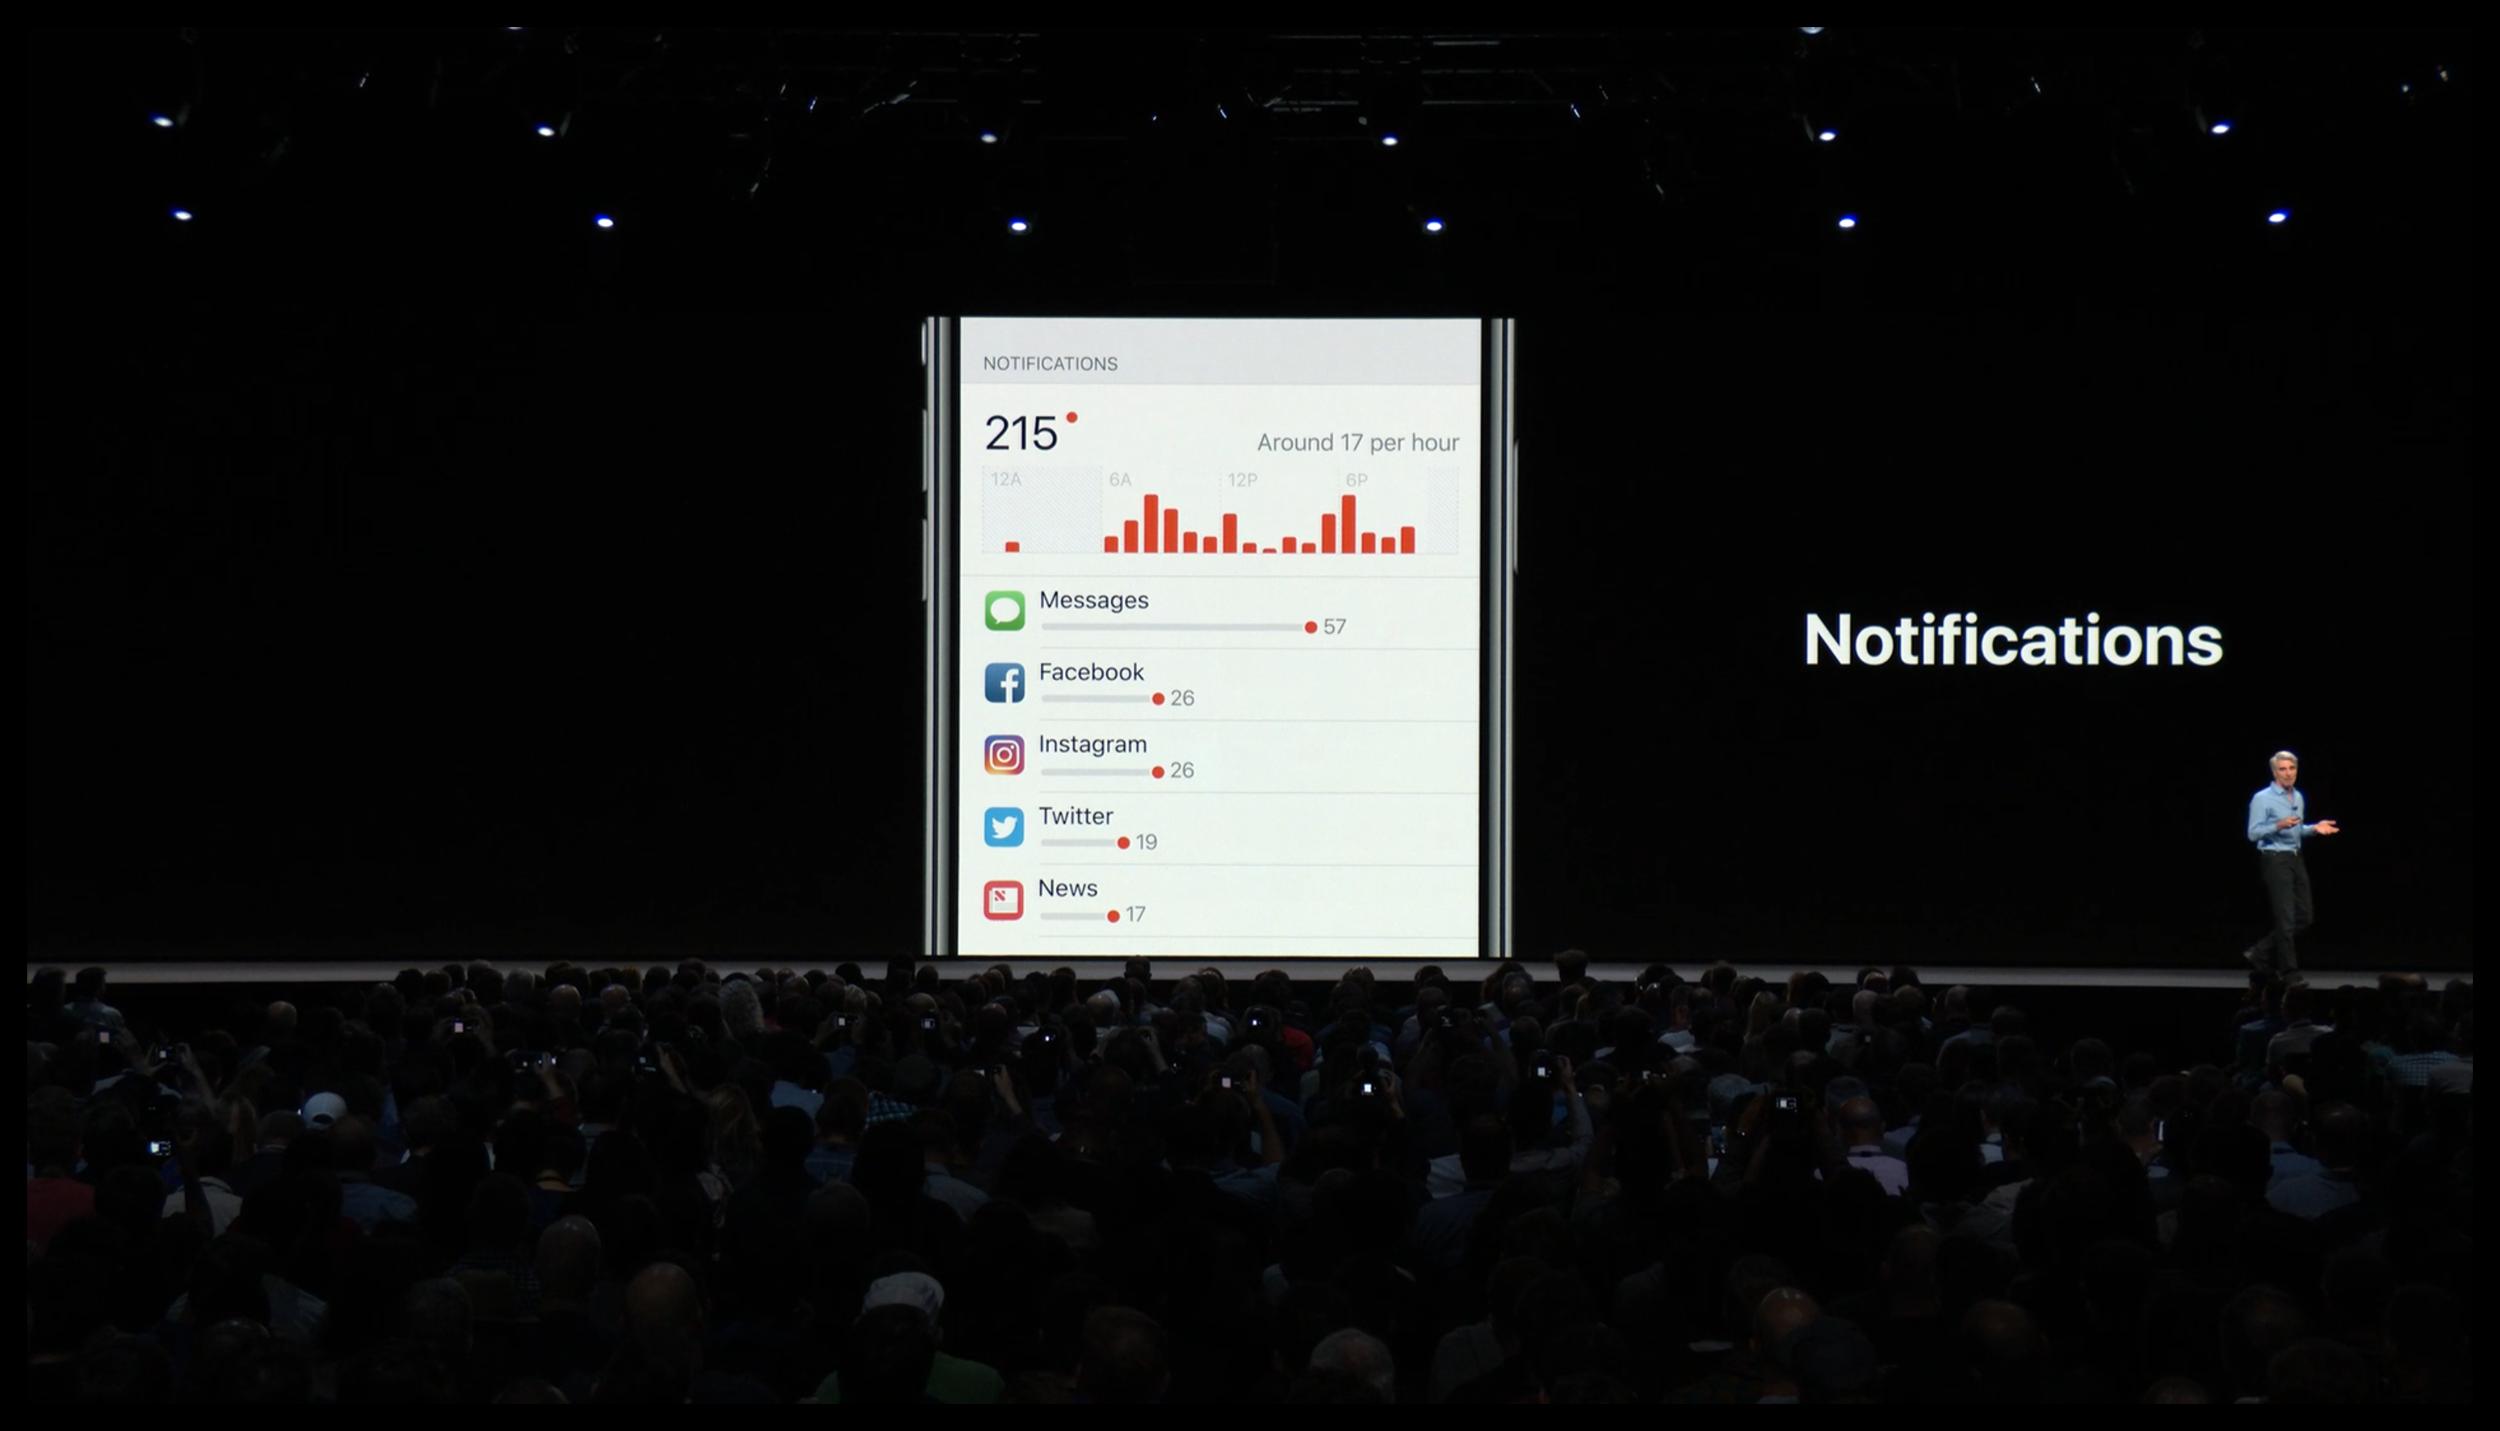 Screenshot 2018-06-10 01.20.07.png